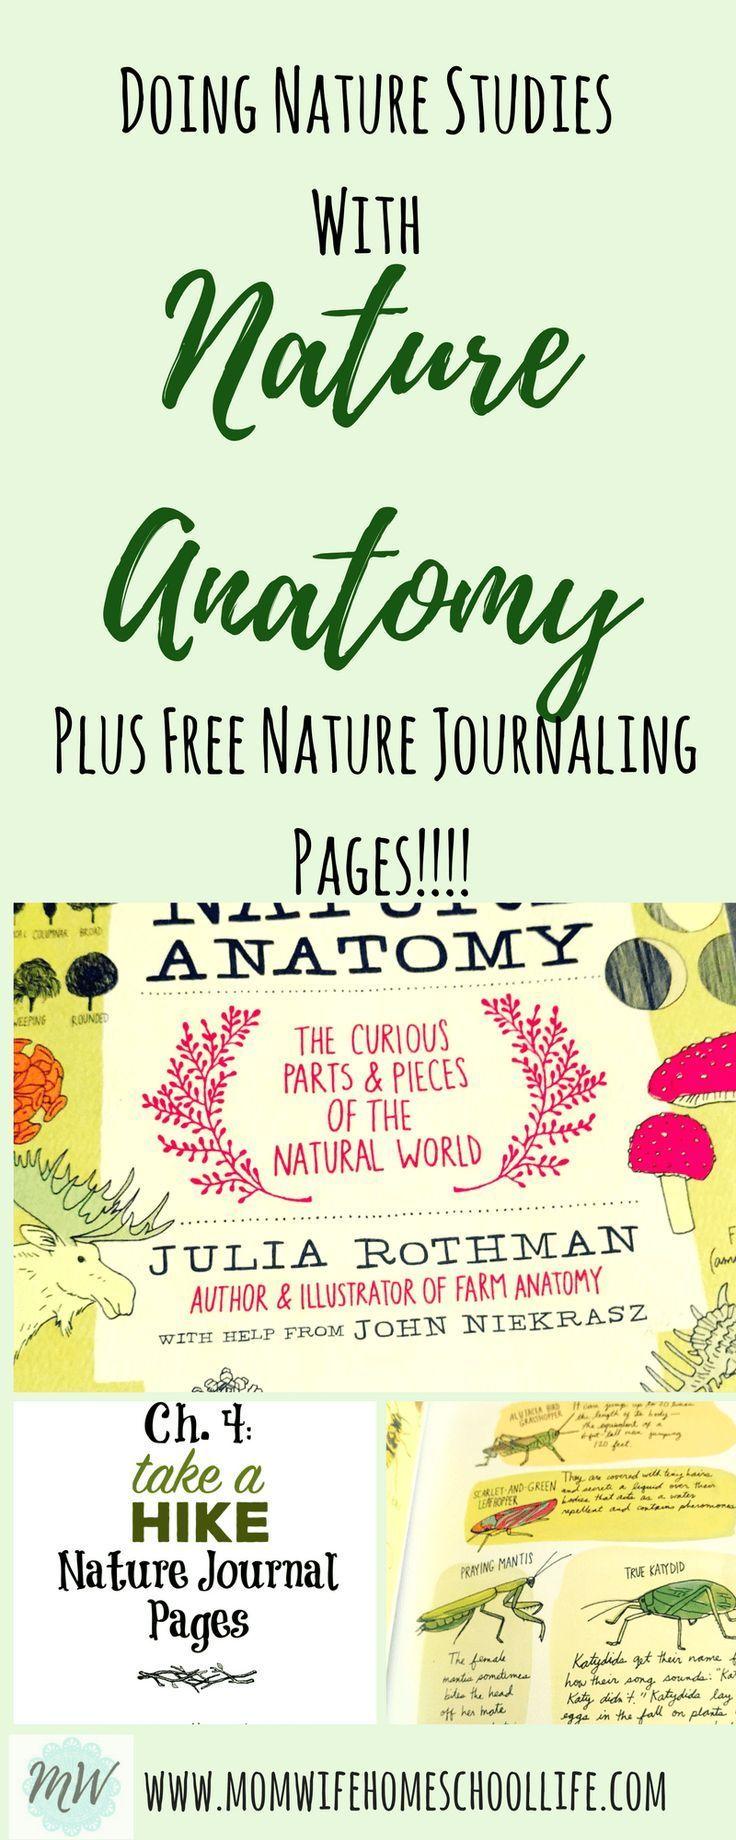 Nature Study With Nature Anatomy | Pinterest | Nature study ...